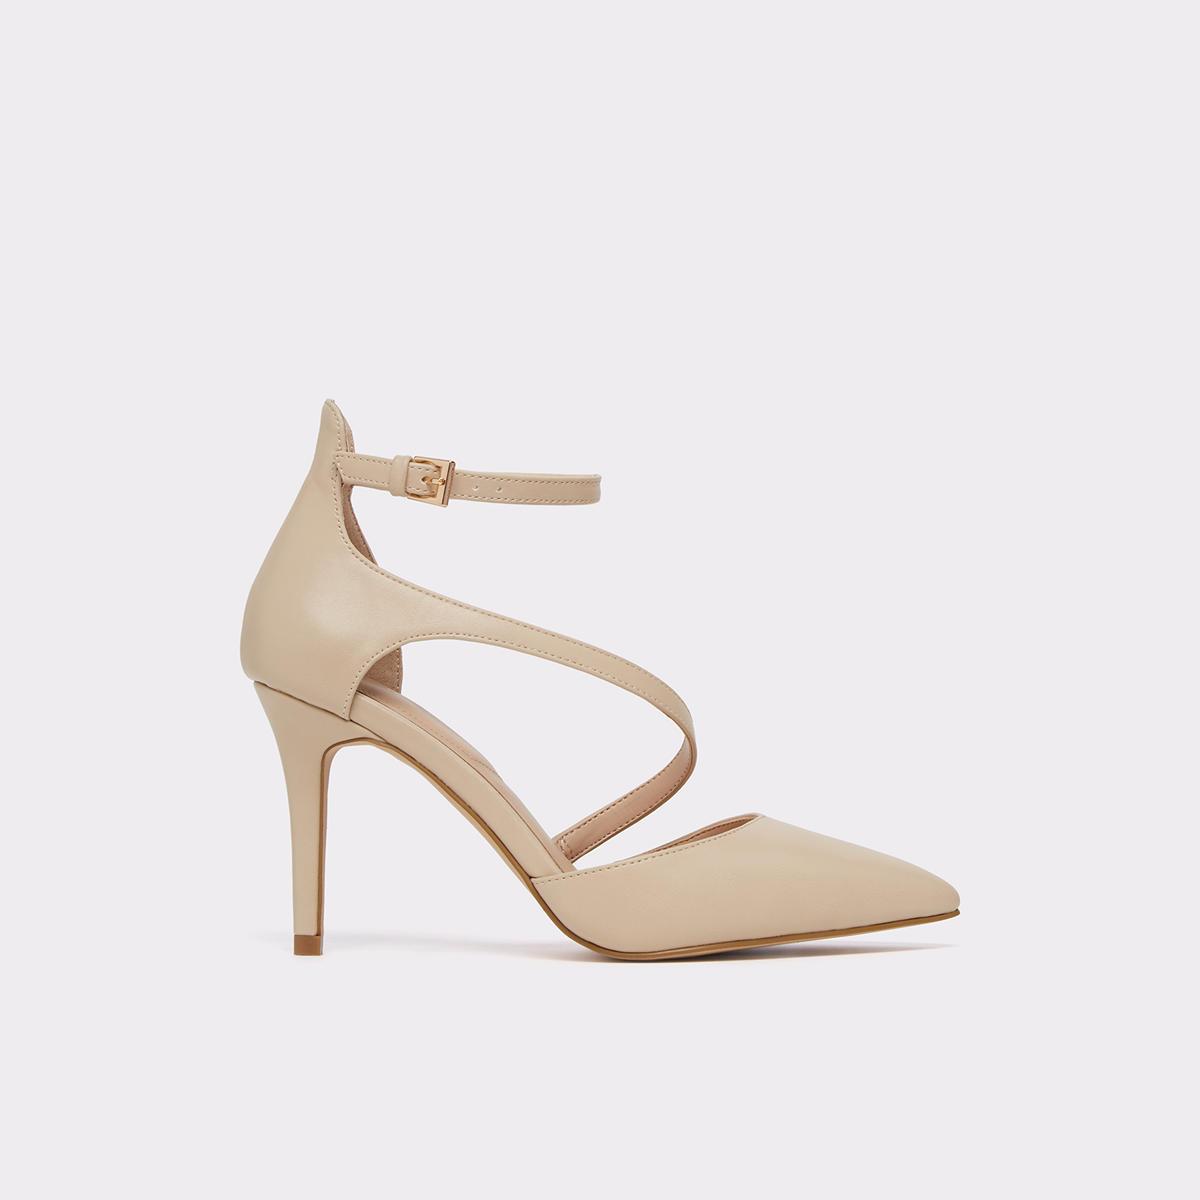 1a4cd516e6b Vetrano Bone Women s Heels